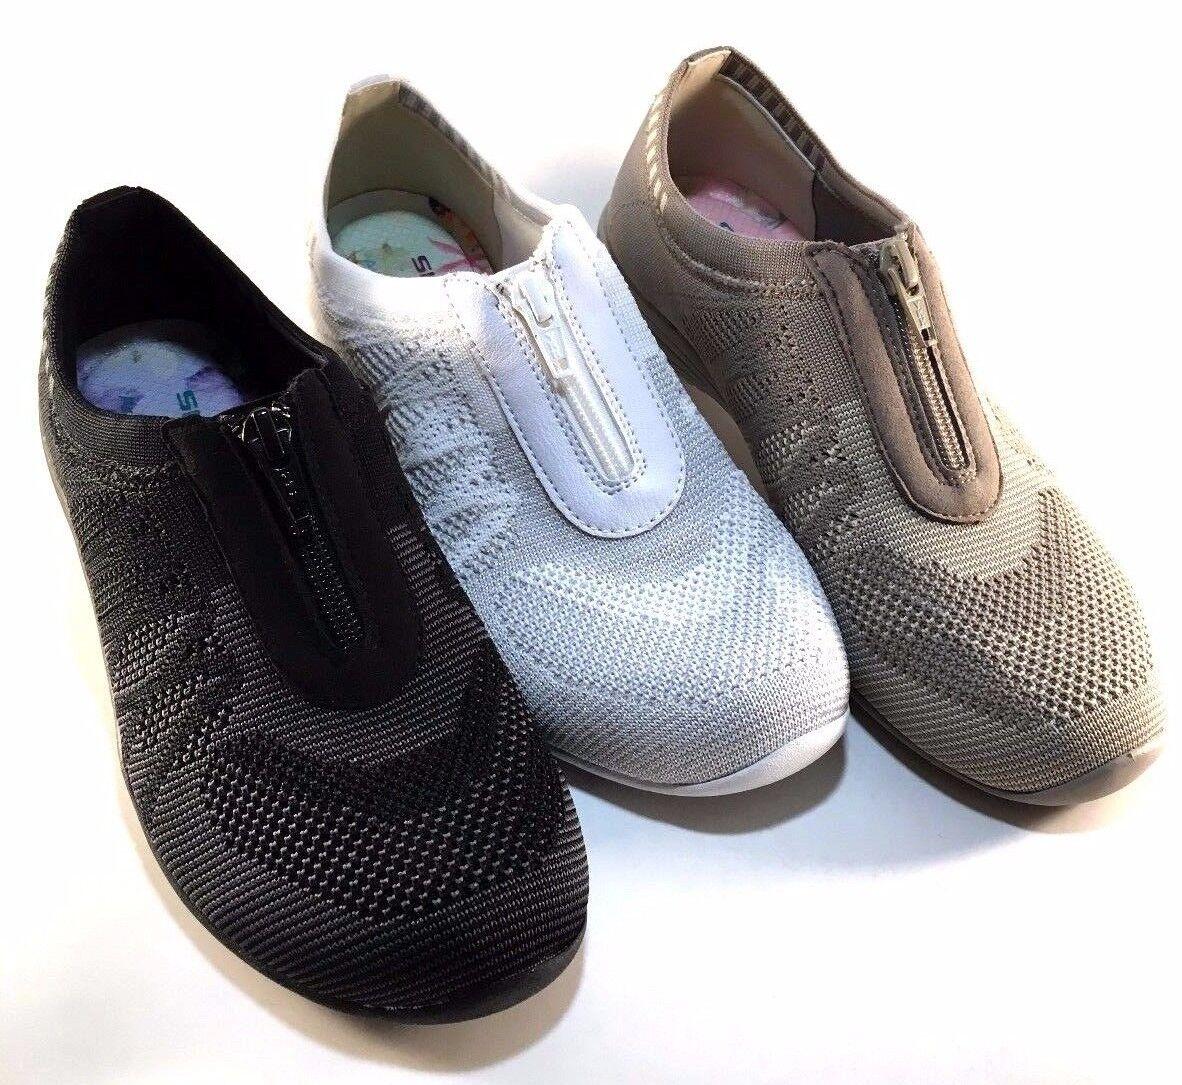 Skechers 23064 Classic Fit AirCooled Memory Foam Slip On Sneaker Choose Sz color